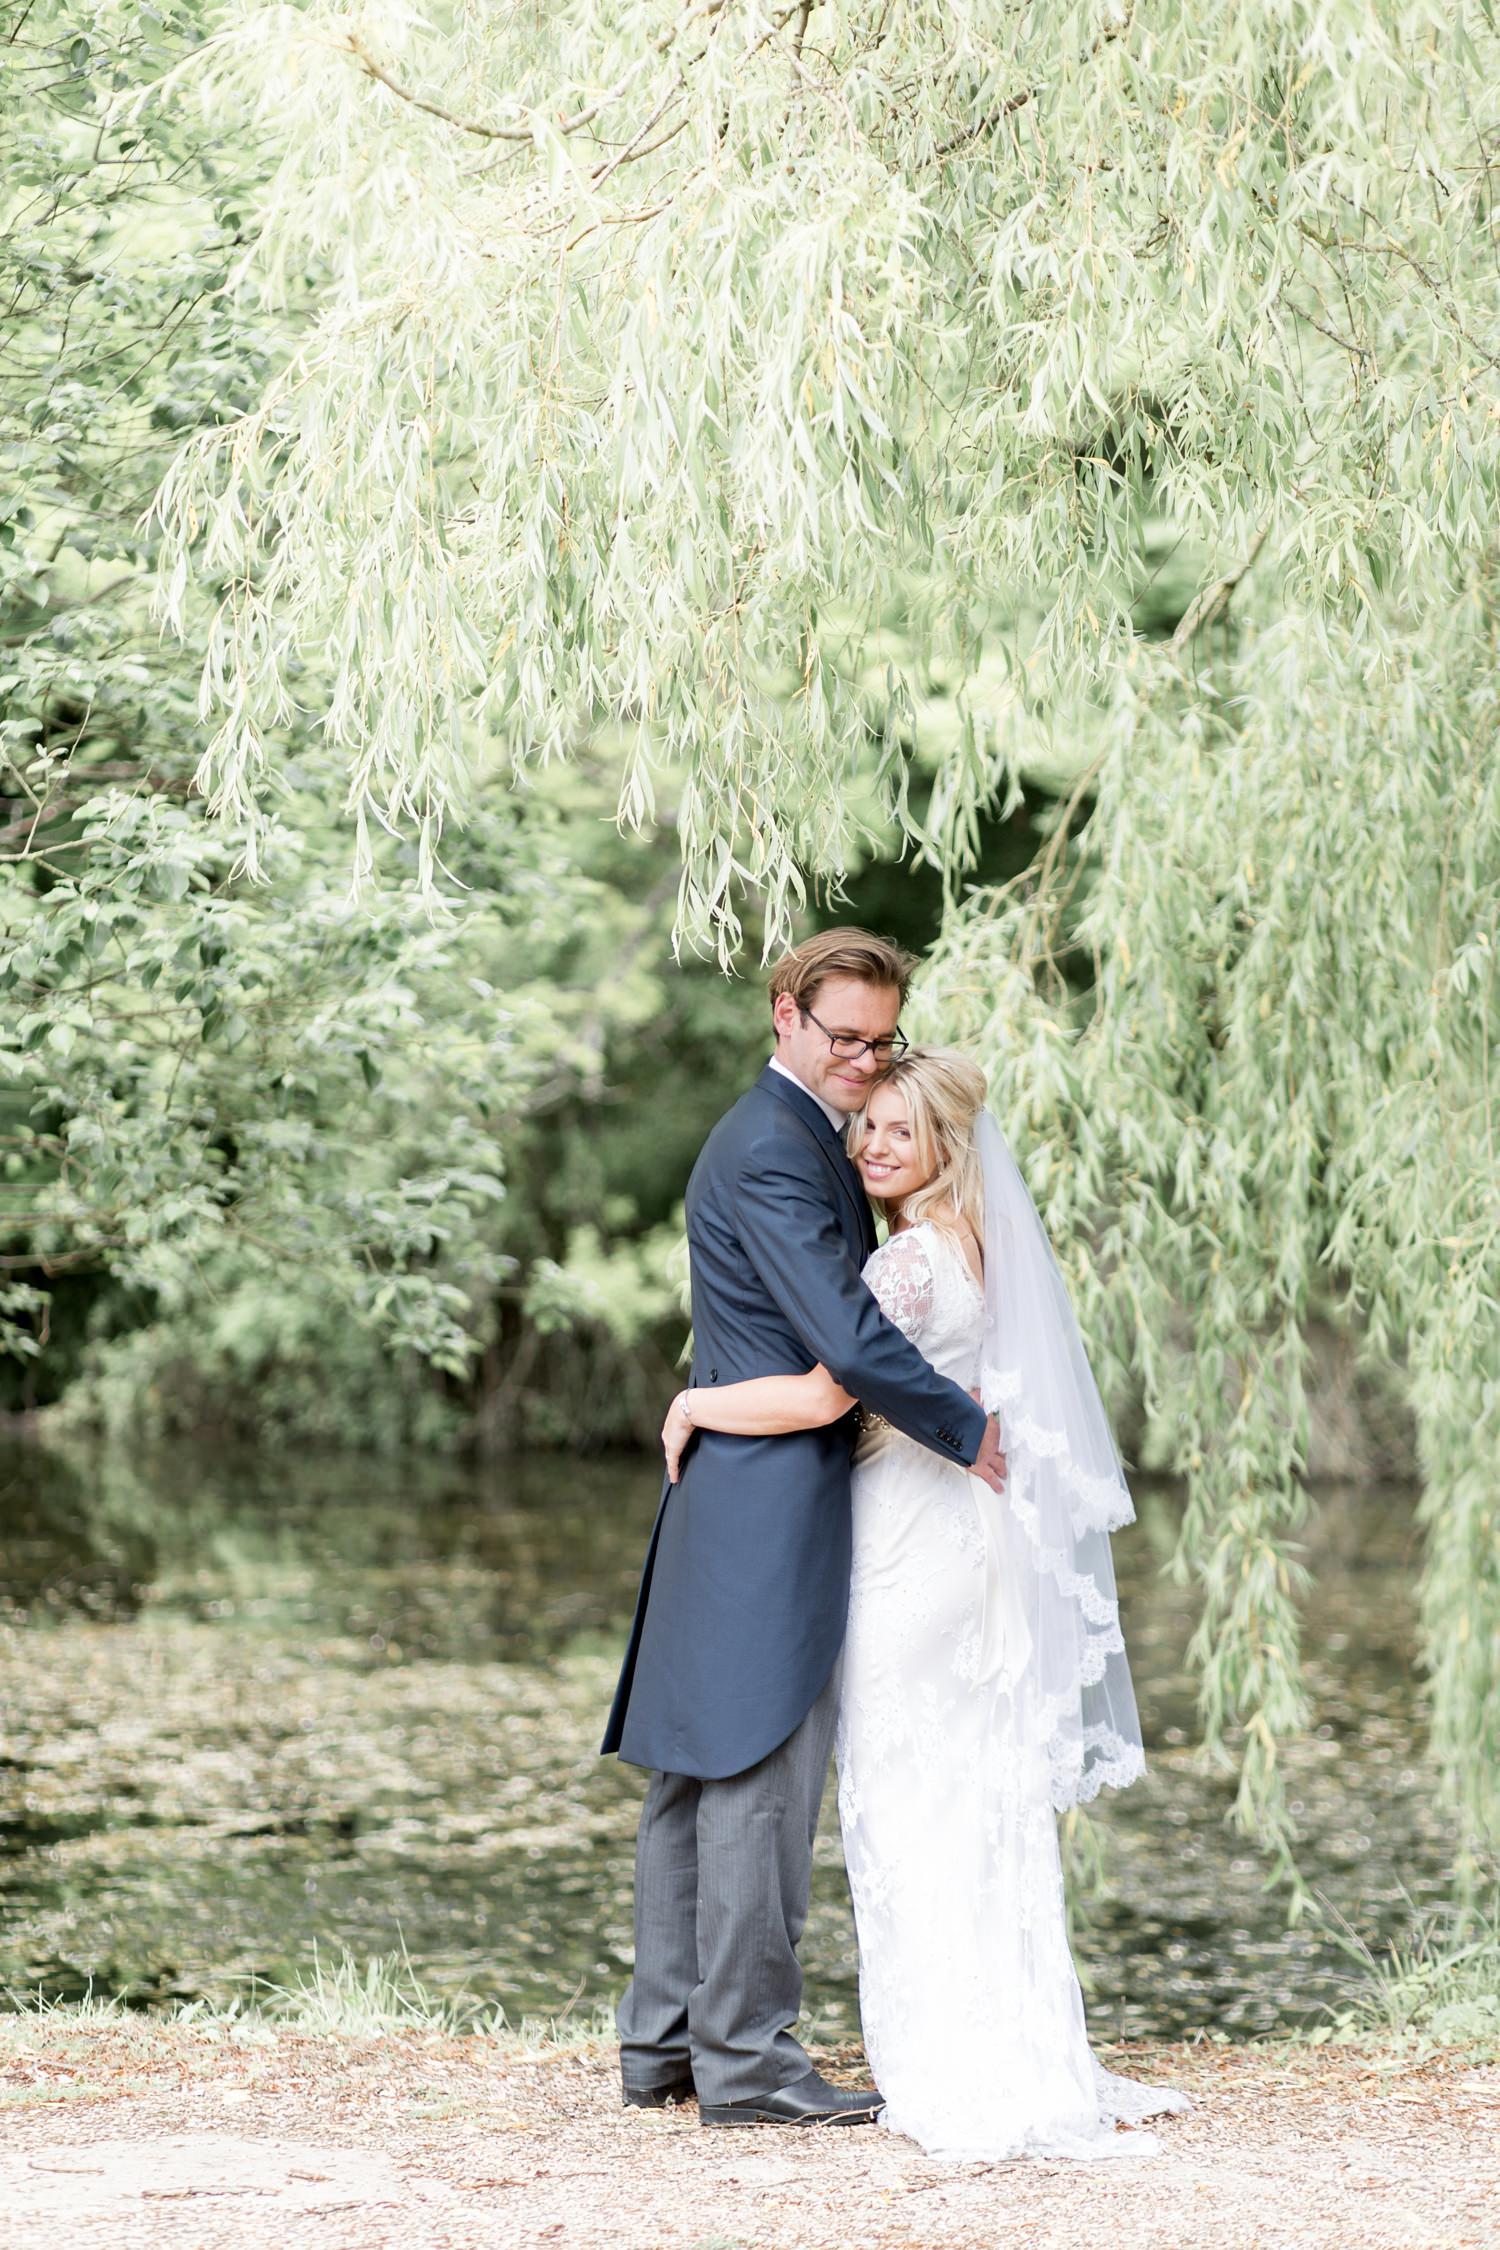 Emily & Jonathan's Cambridgeshire wedding - couple standing under weeping willow